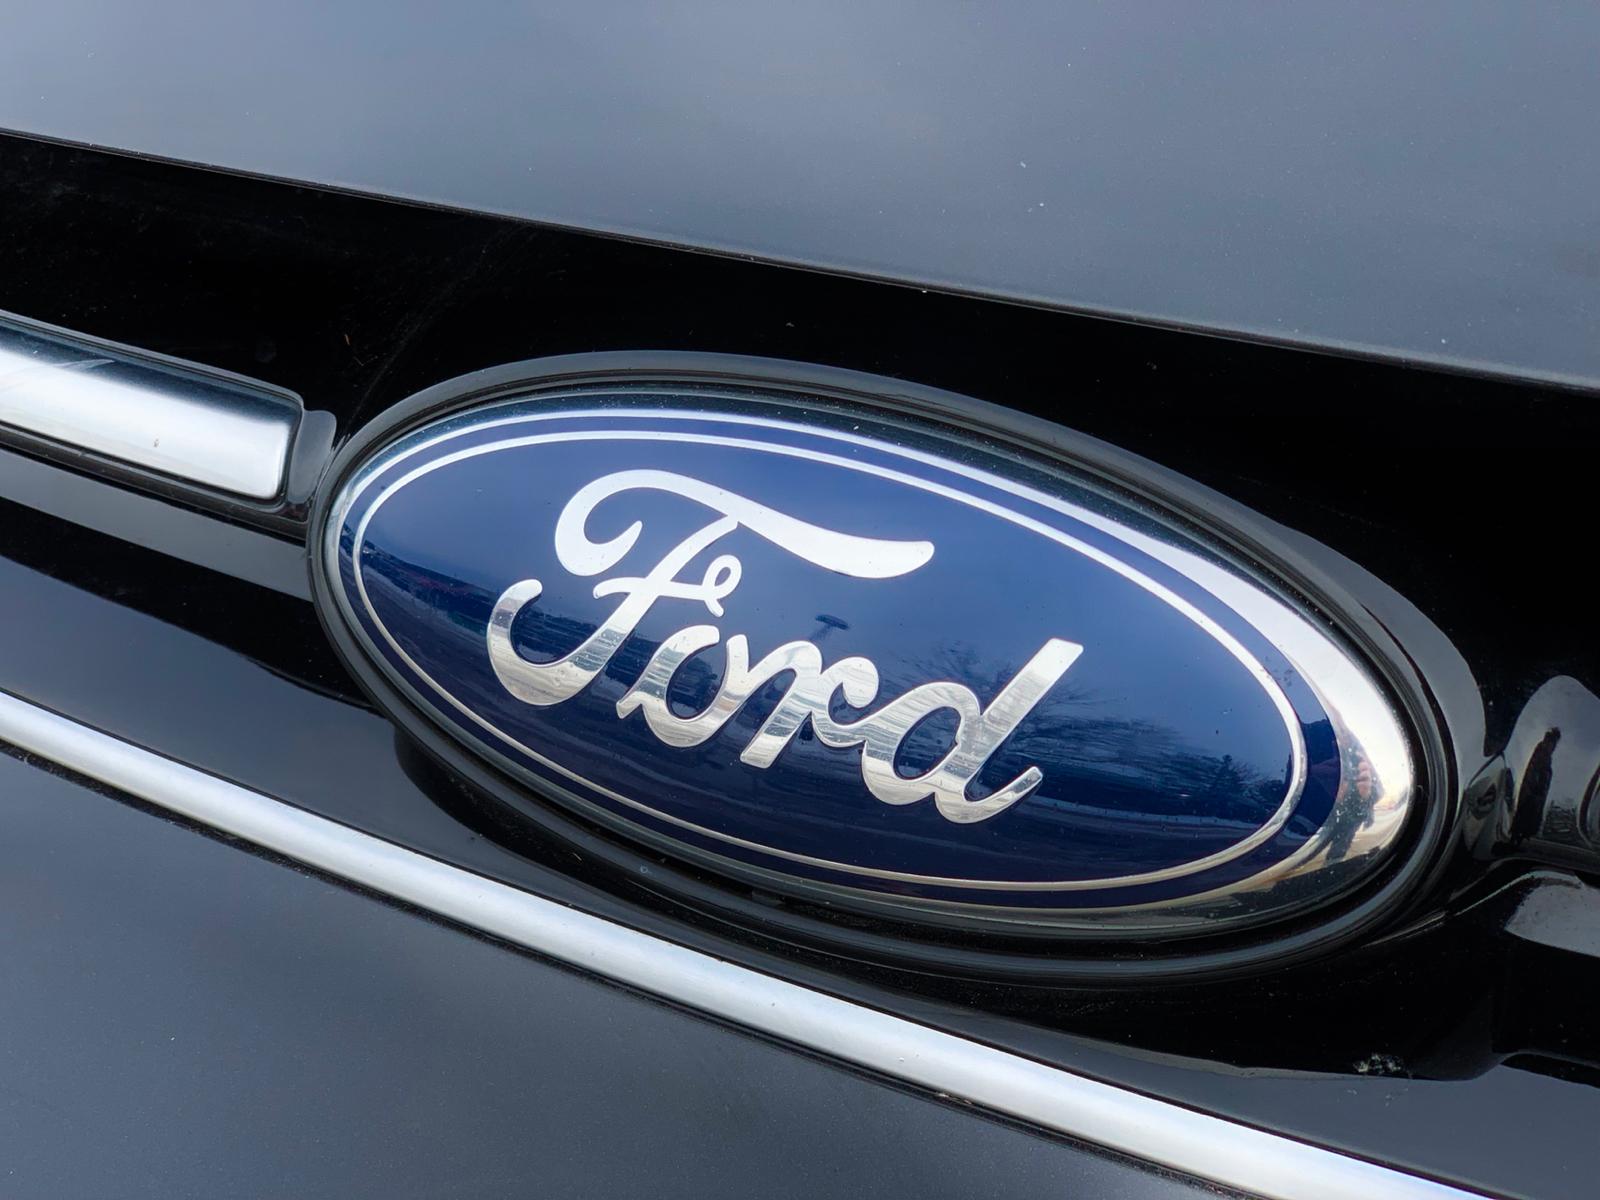 2014 Ford C-MAX SEL Hybrid